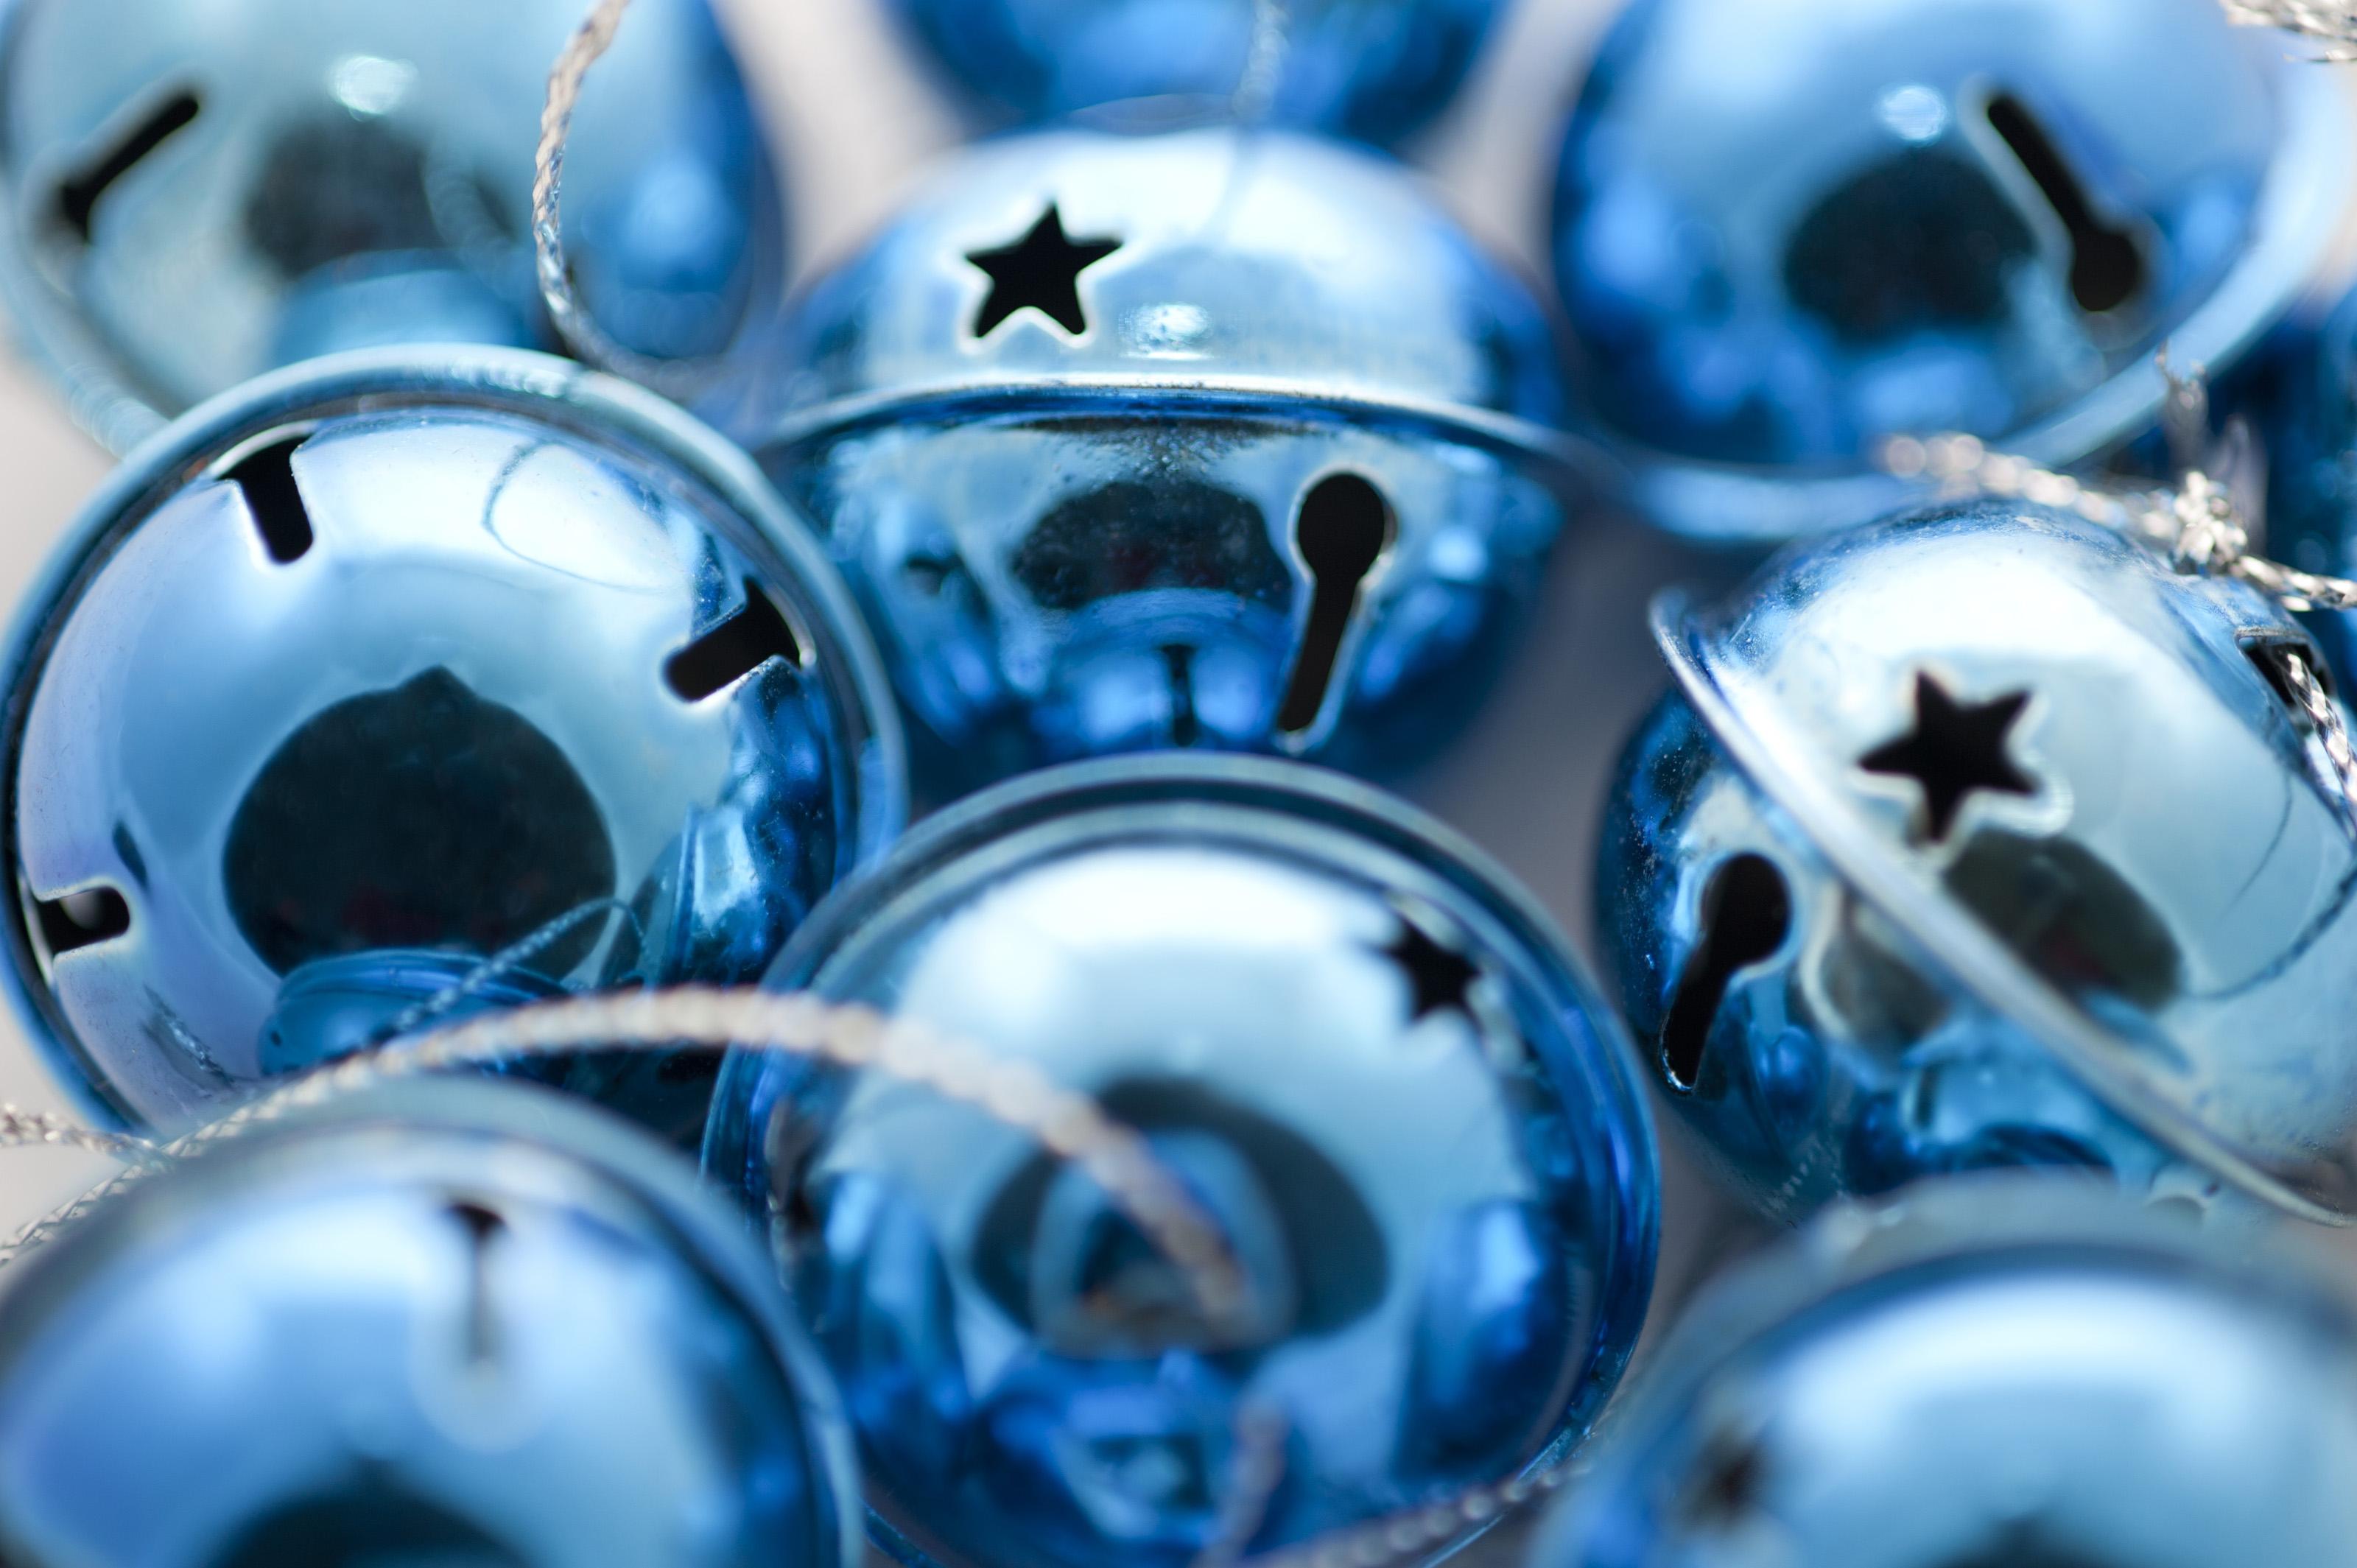 Free stock photo shiny blue jingle bells freeimageslive